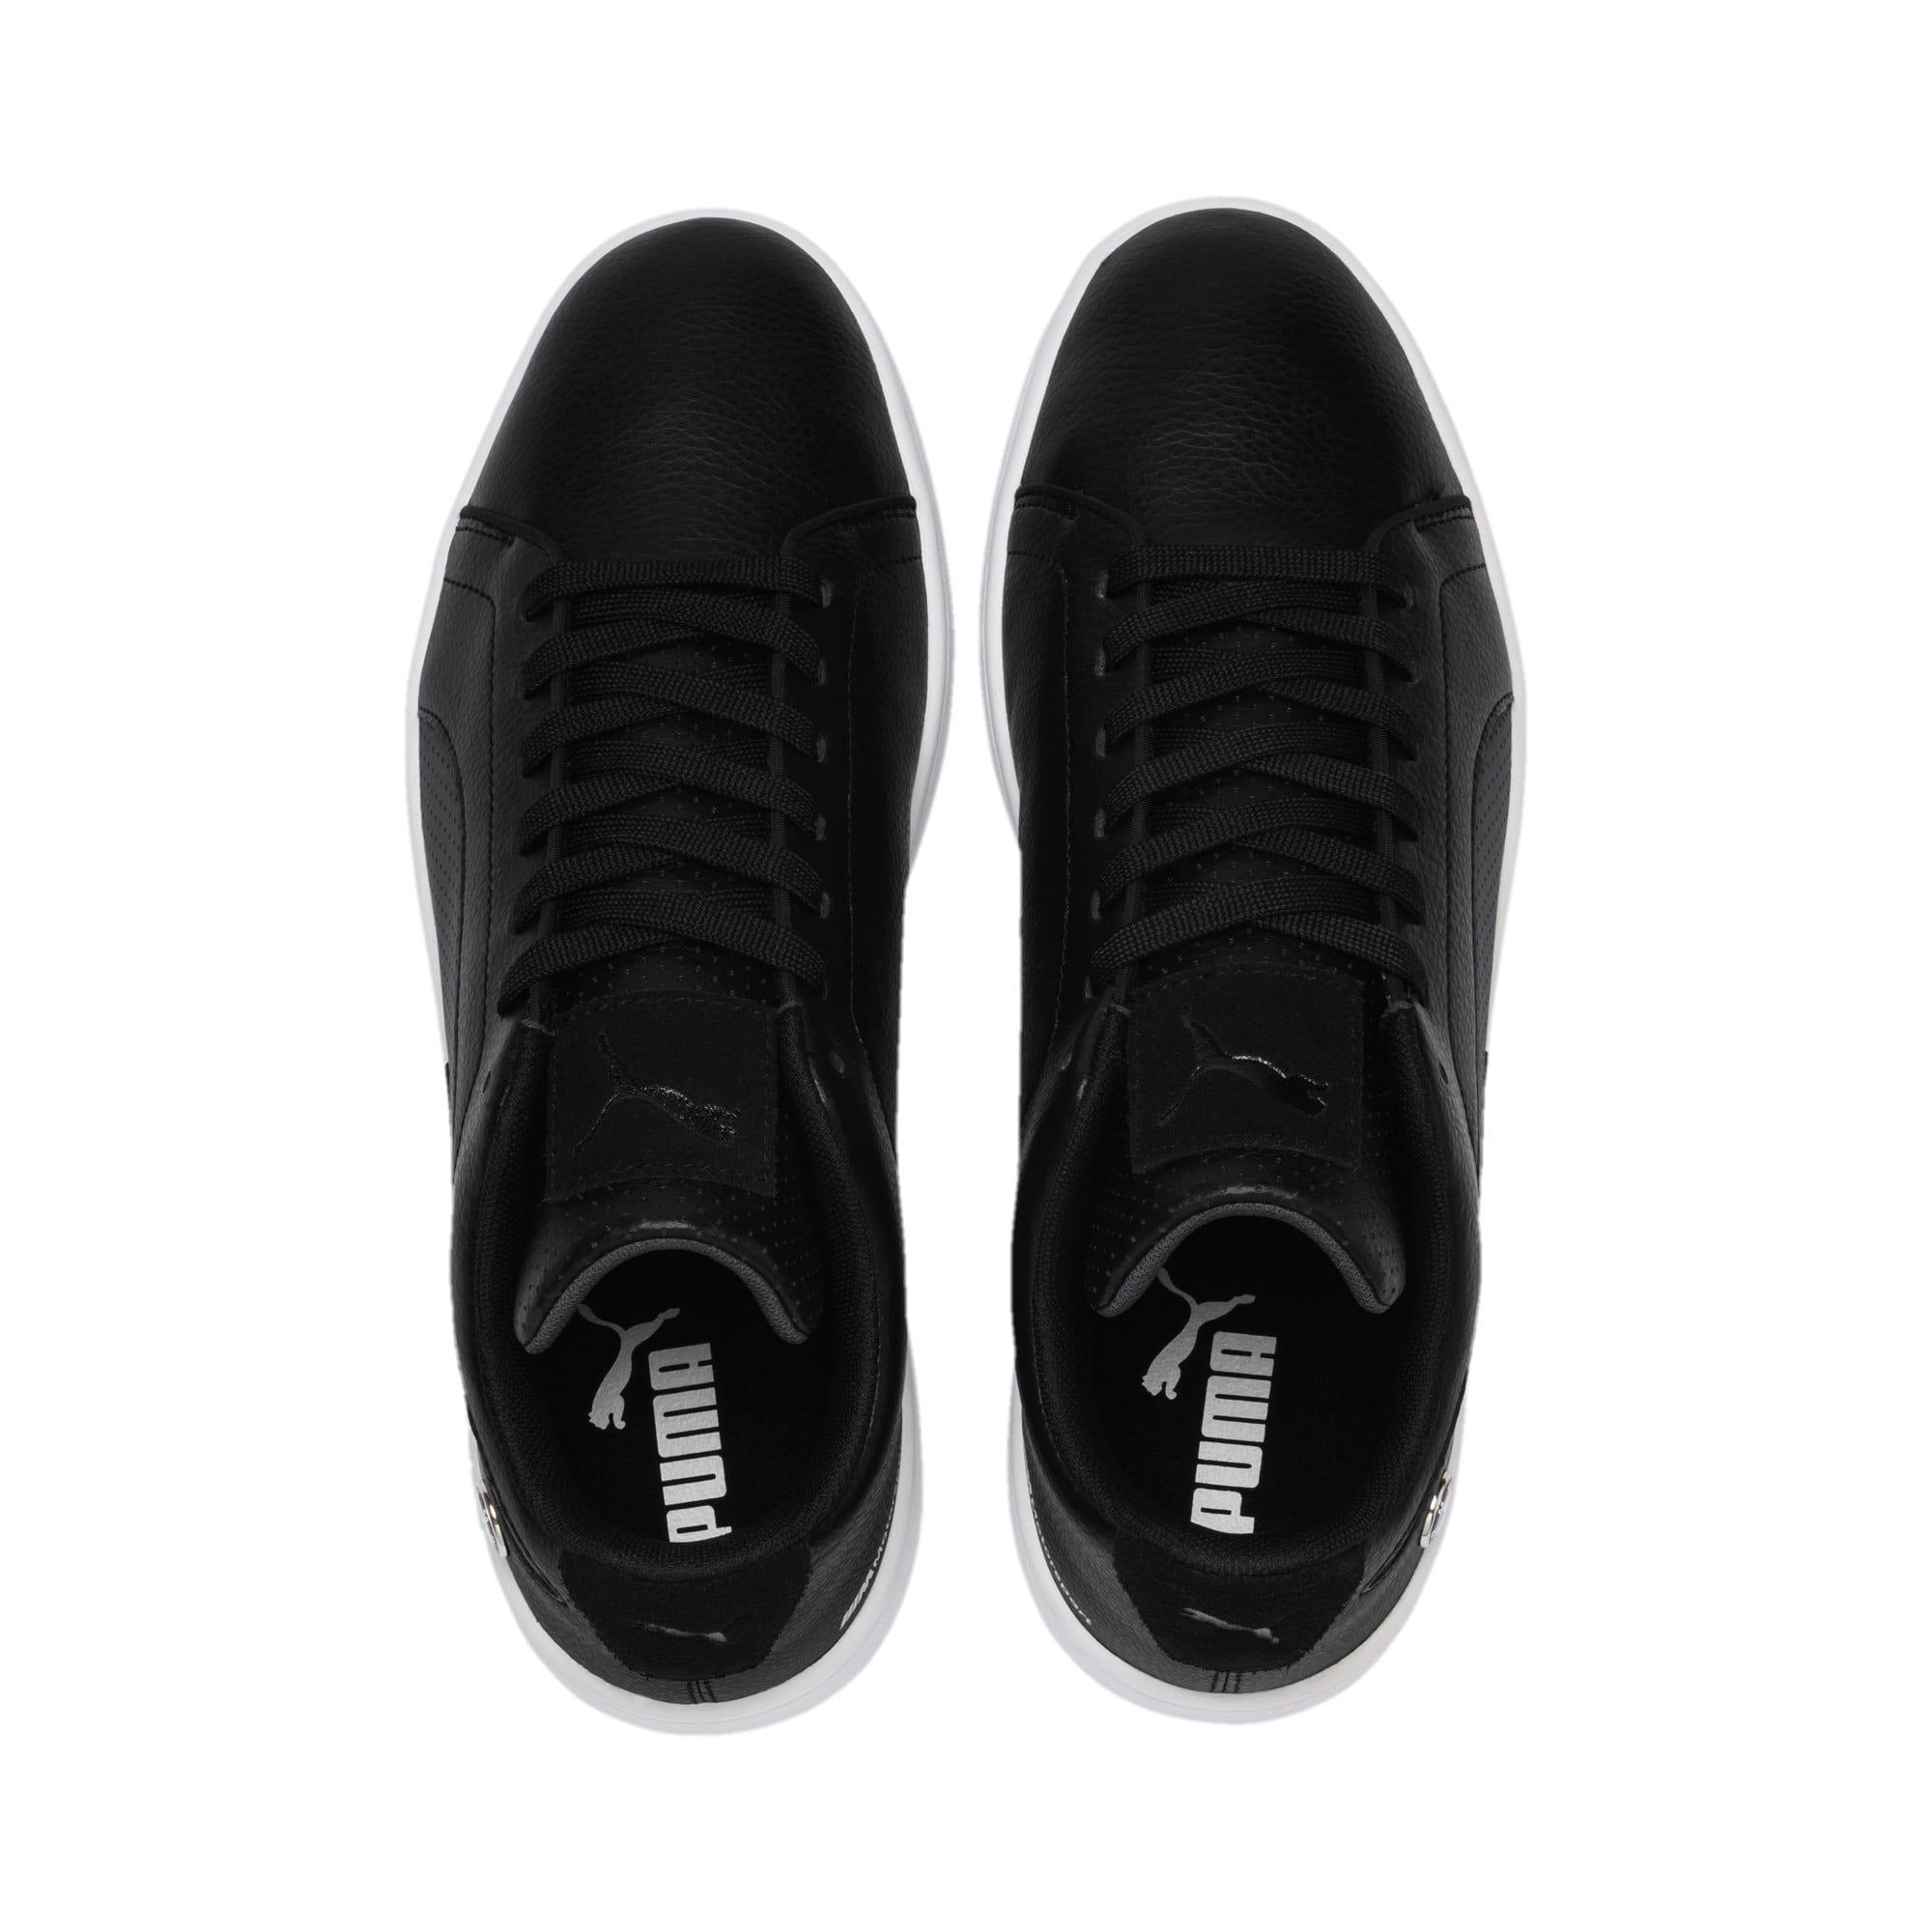 Miniatura 6 de Zapatos deportivos BMW M Motorsport Smash v2, Puma Black-Asphalt, mediano